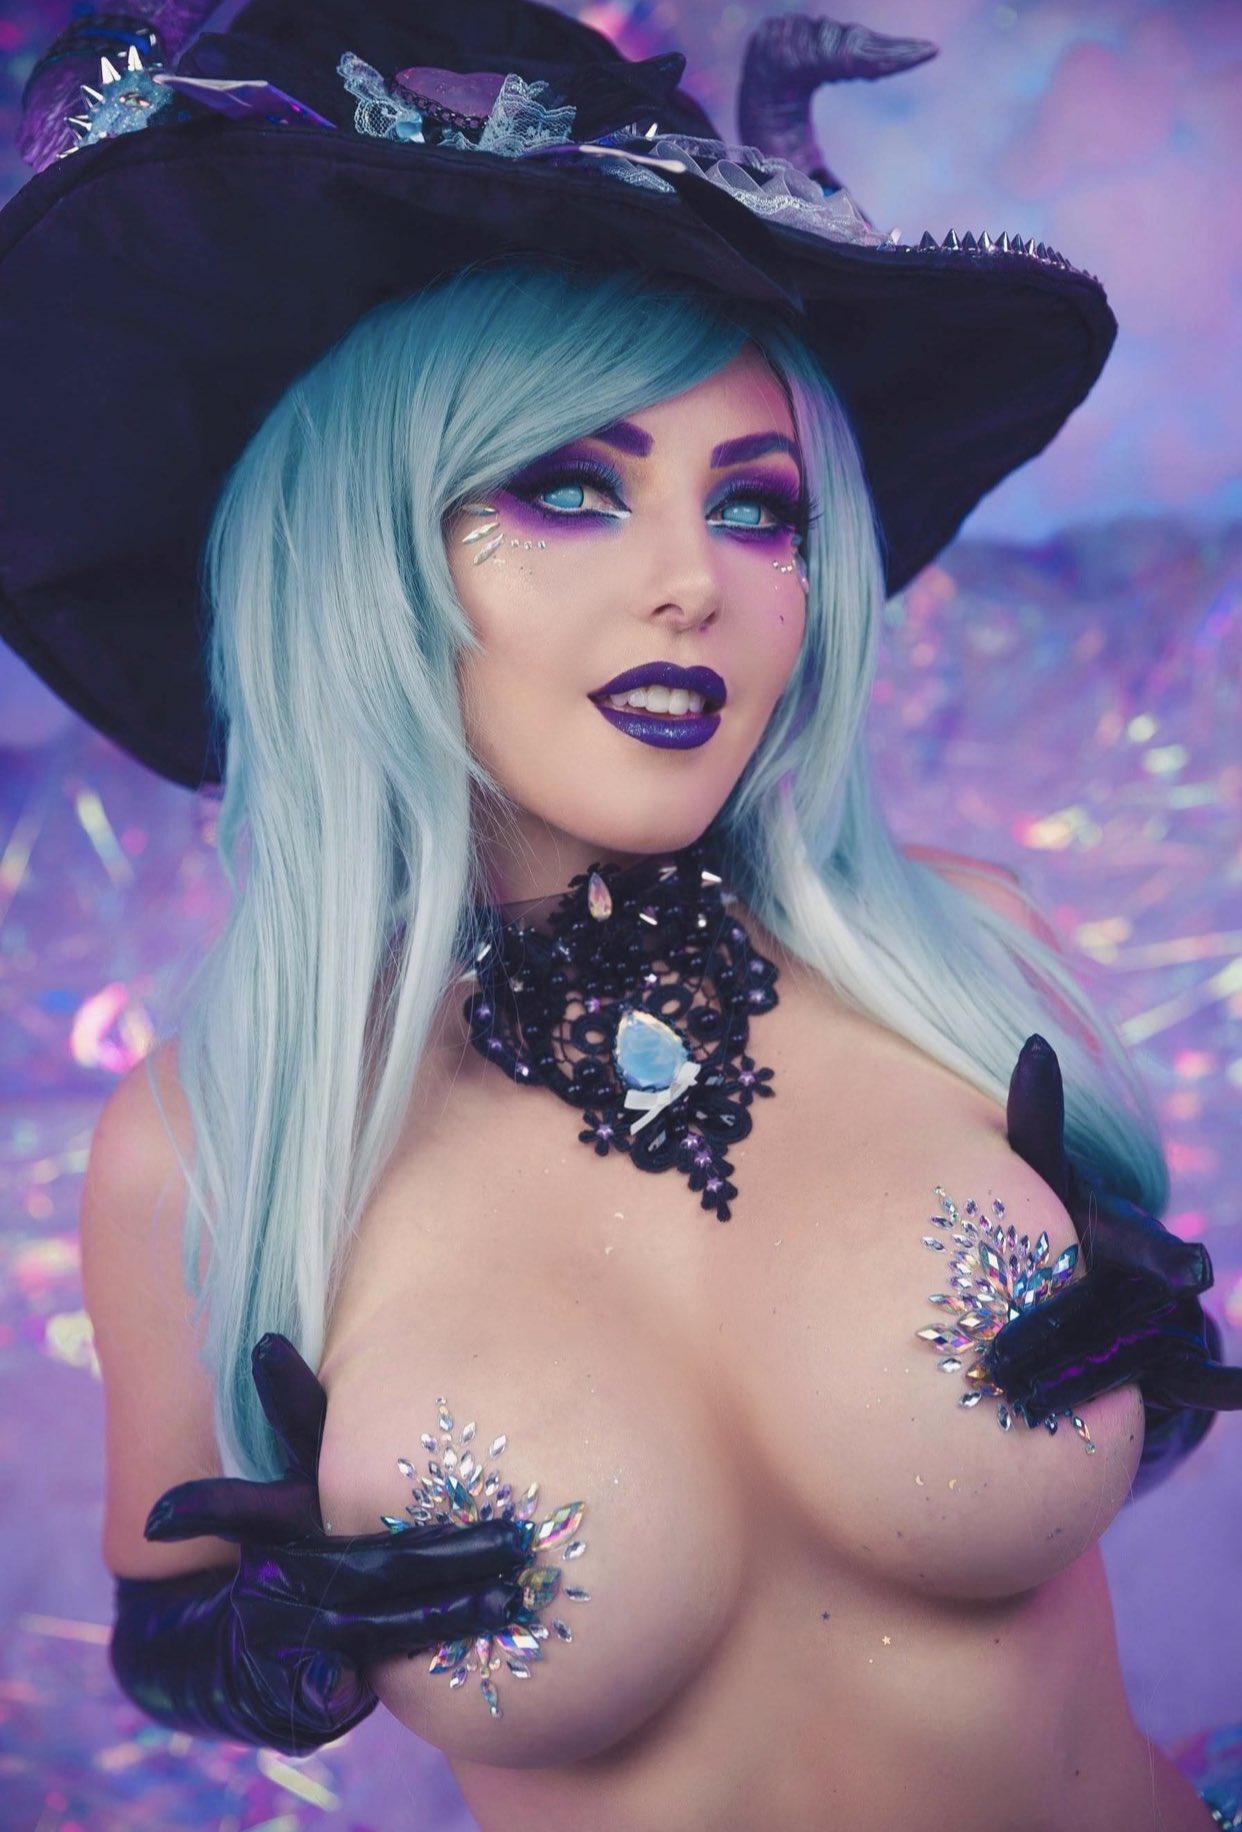 Jessica Nigri As A Witch